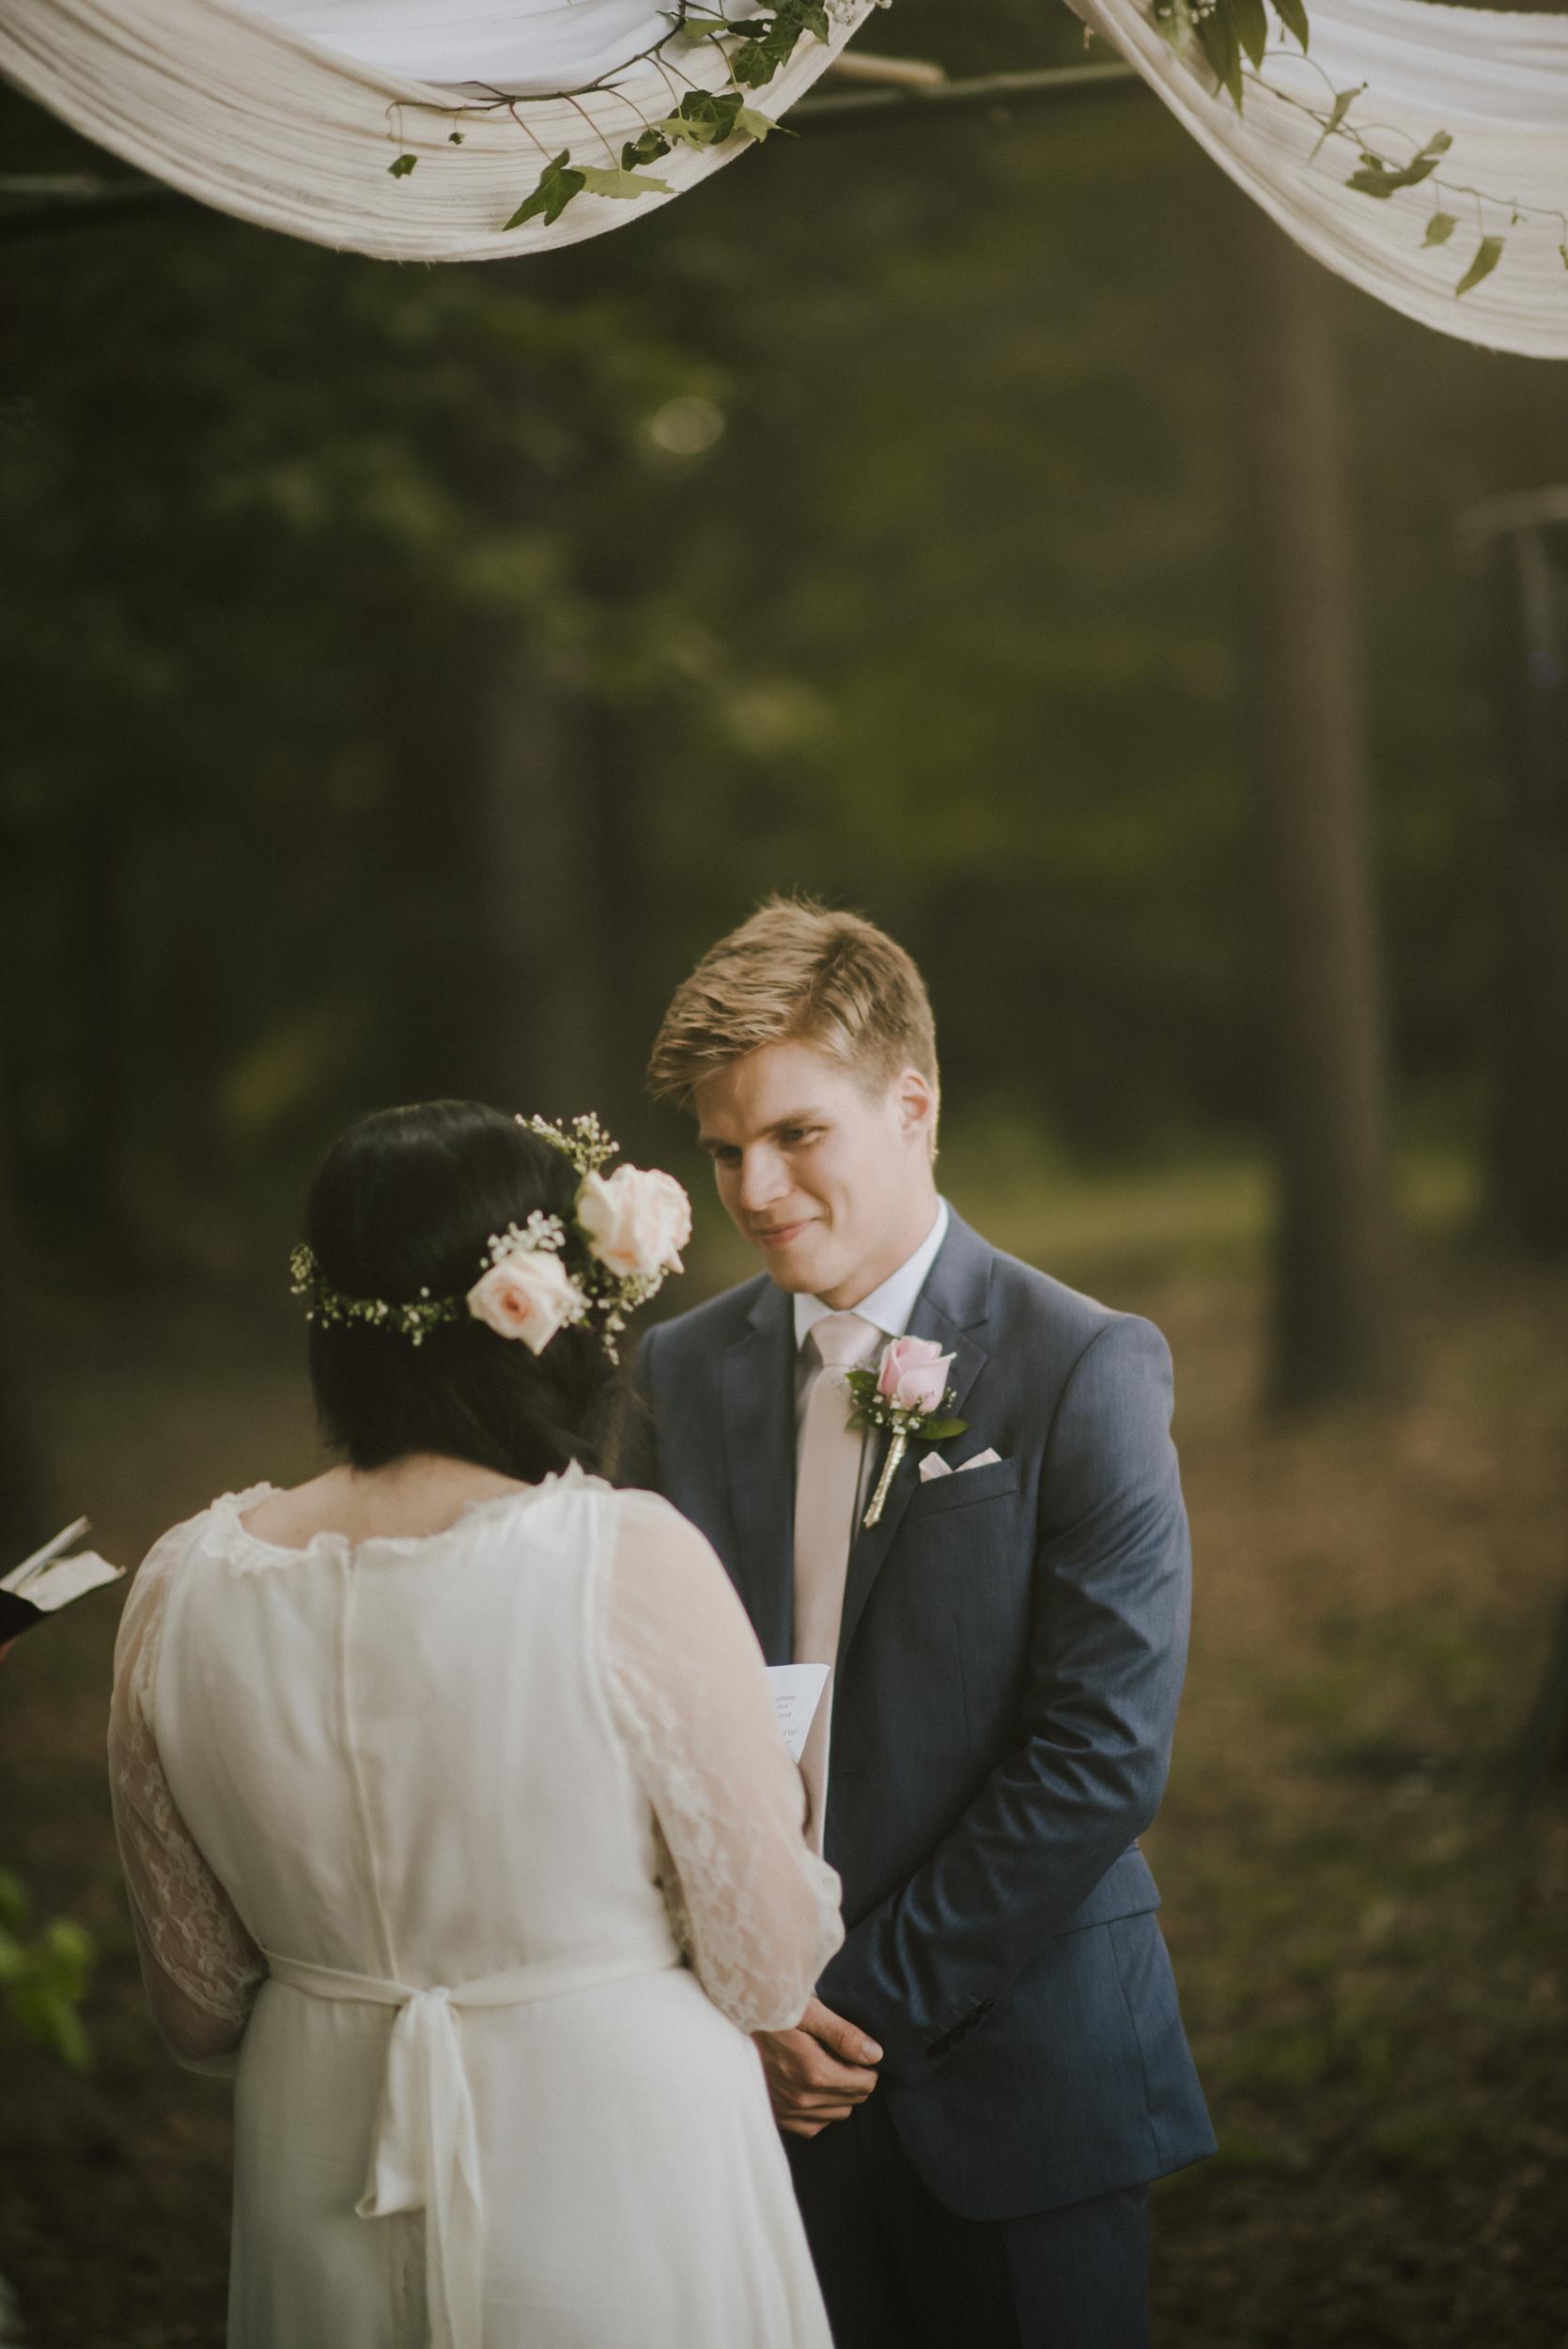 ofRen_weddingphotographer-134.jpg